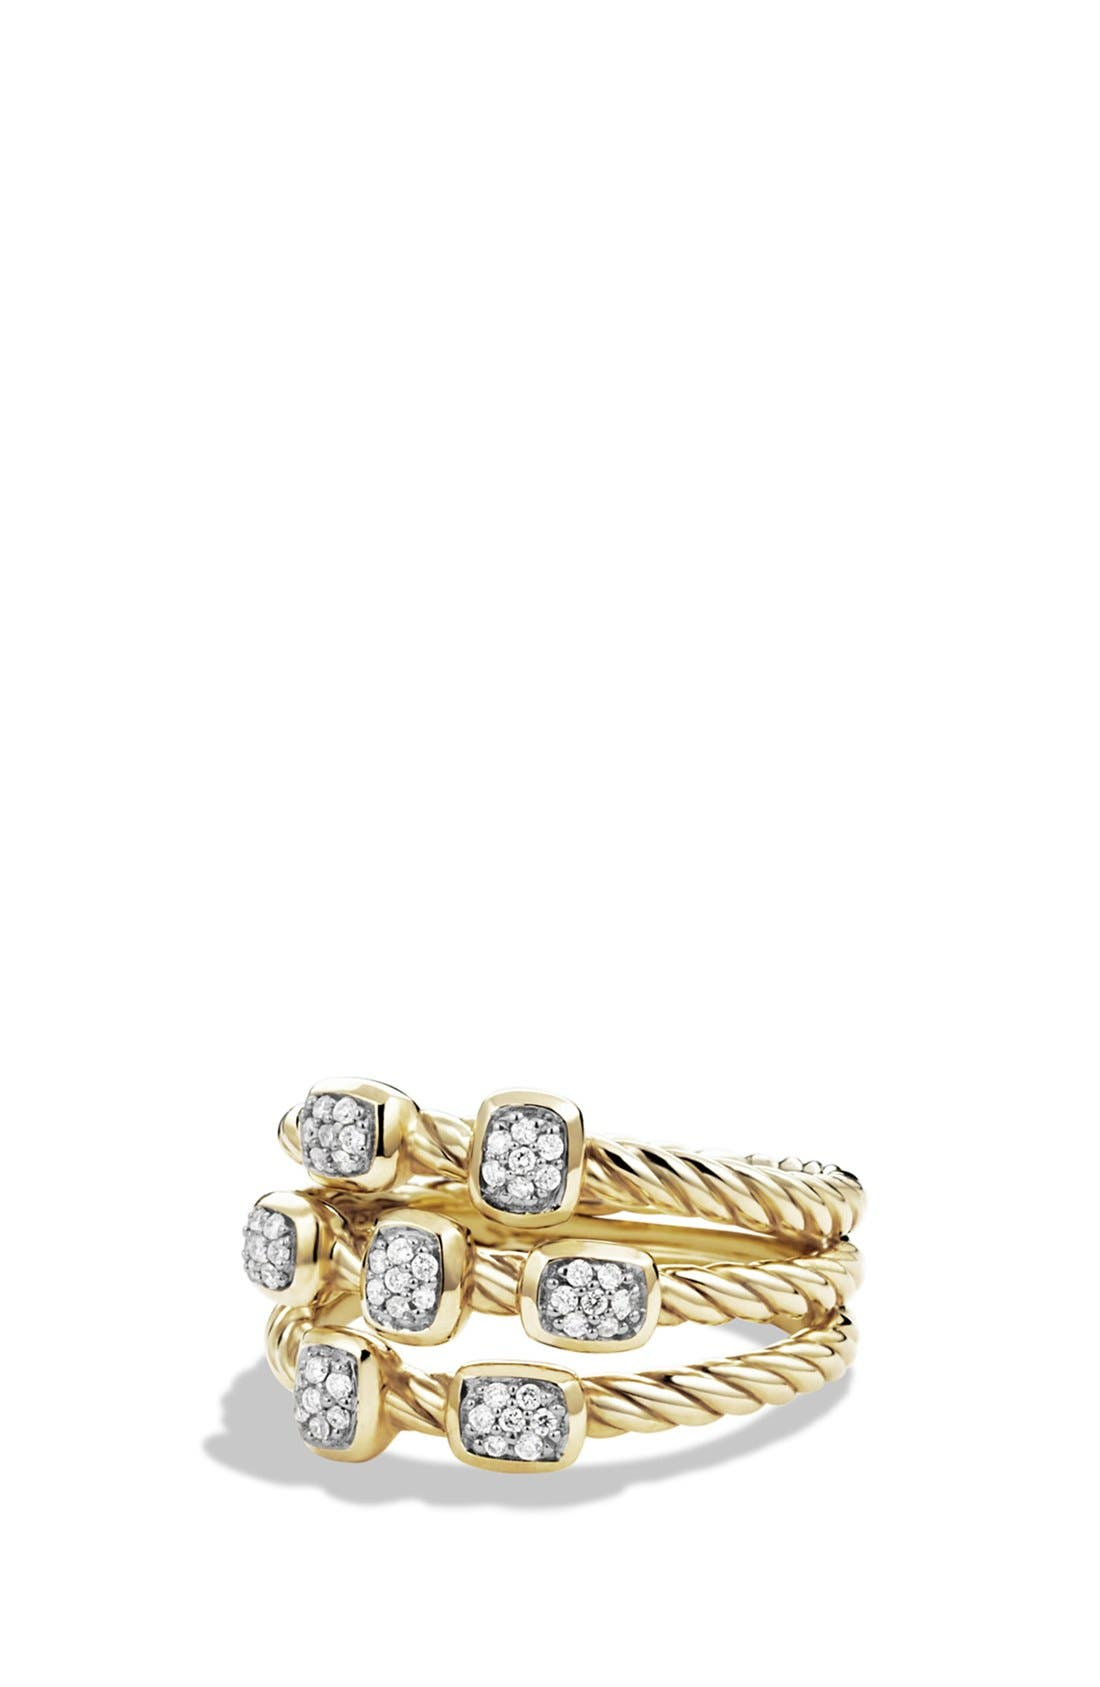 David Yurman 'Confetti' Ring with Diamonds in Gold